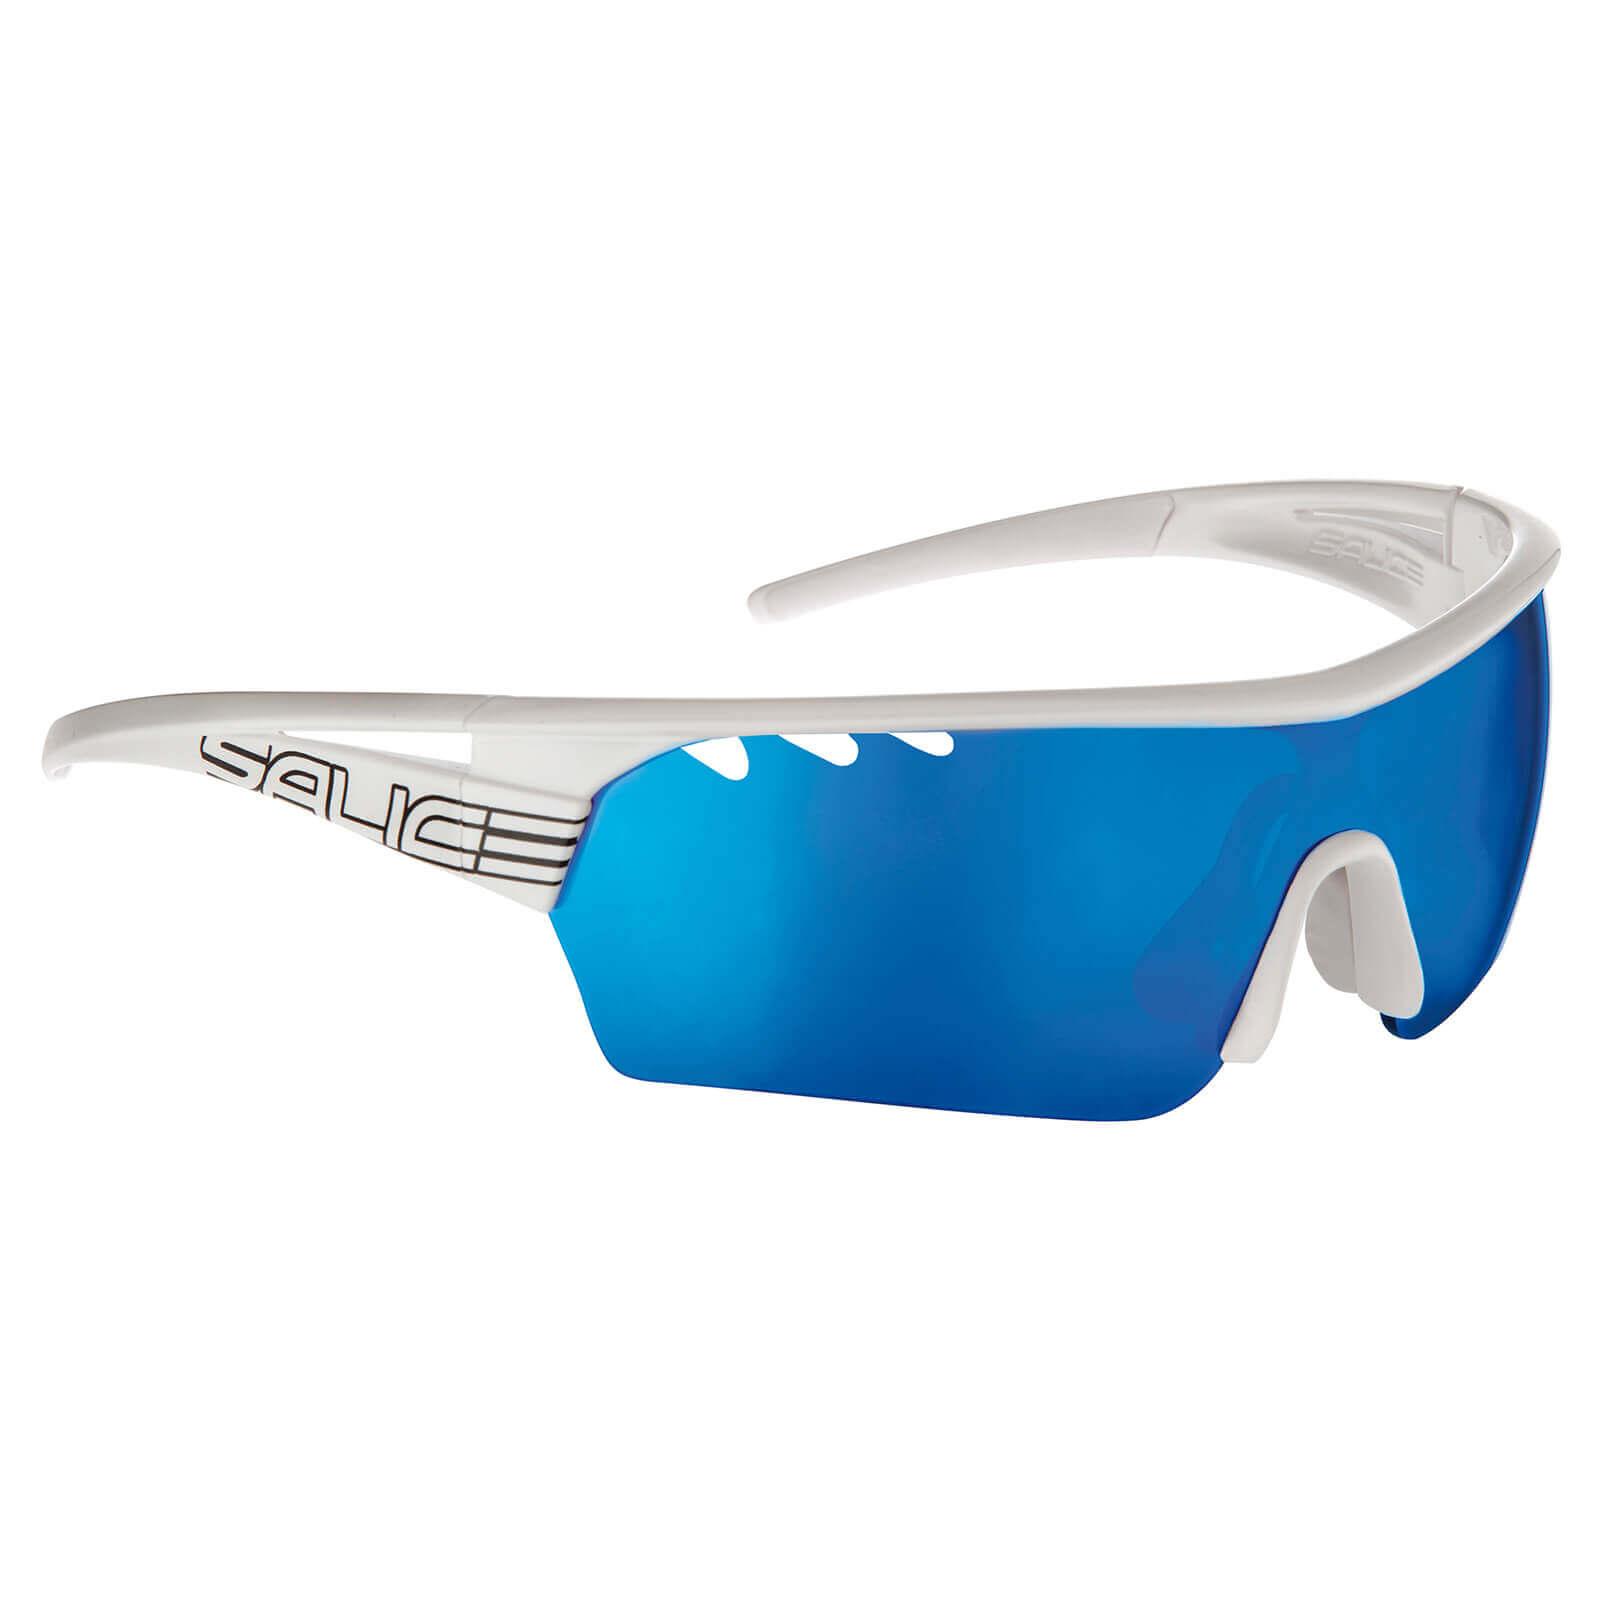 Salice 006 RW Mirror Sunglasses - White/Blue